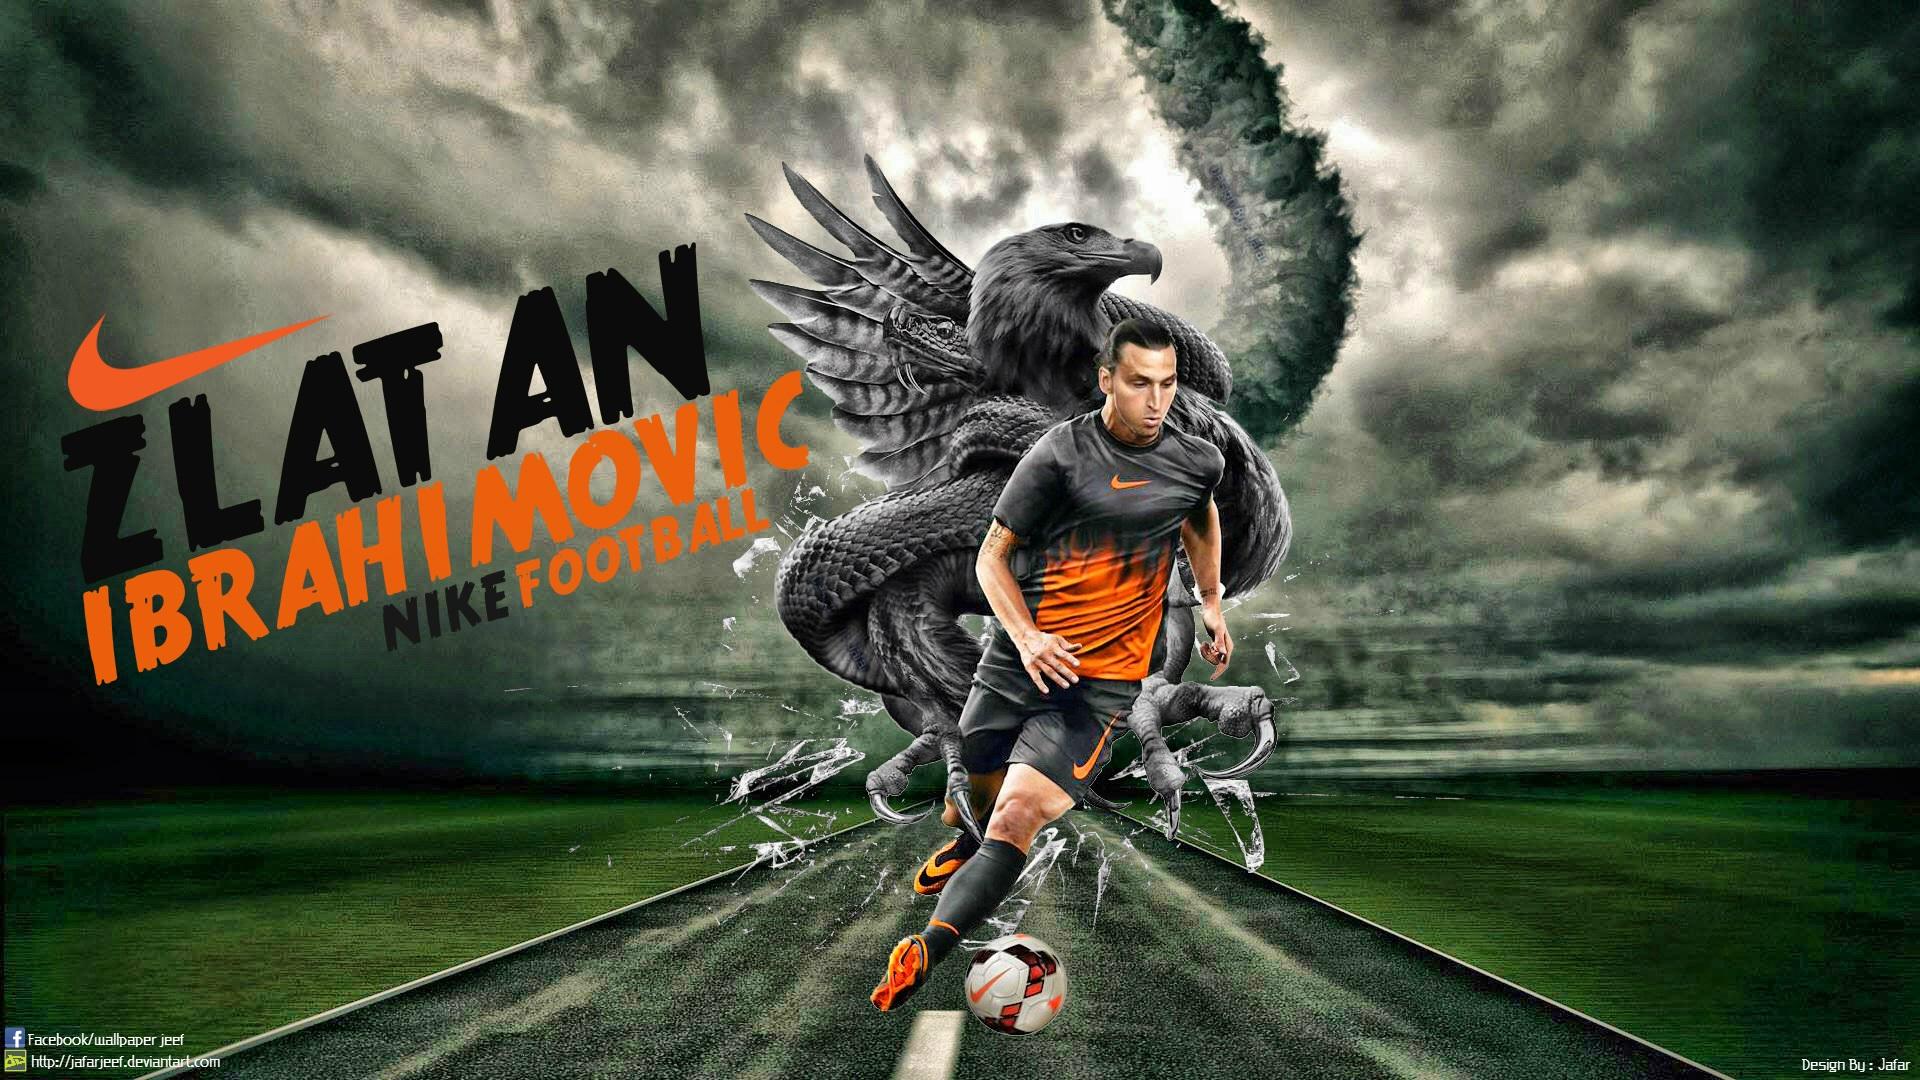 Zlatan Ibrahimovic HD Wallpaper Background Image 1920x1080 1920x1080